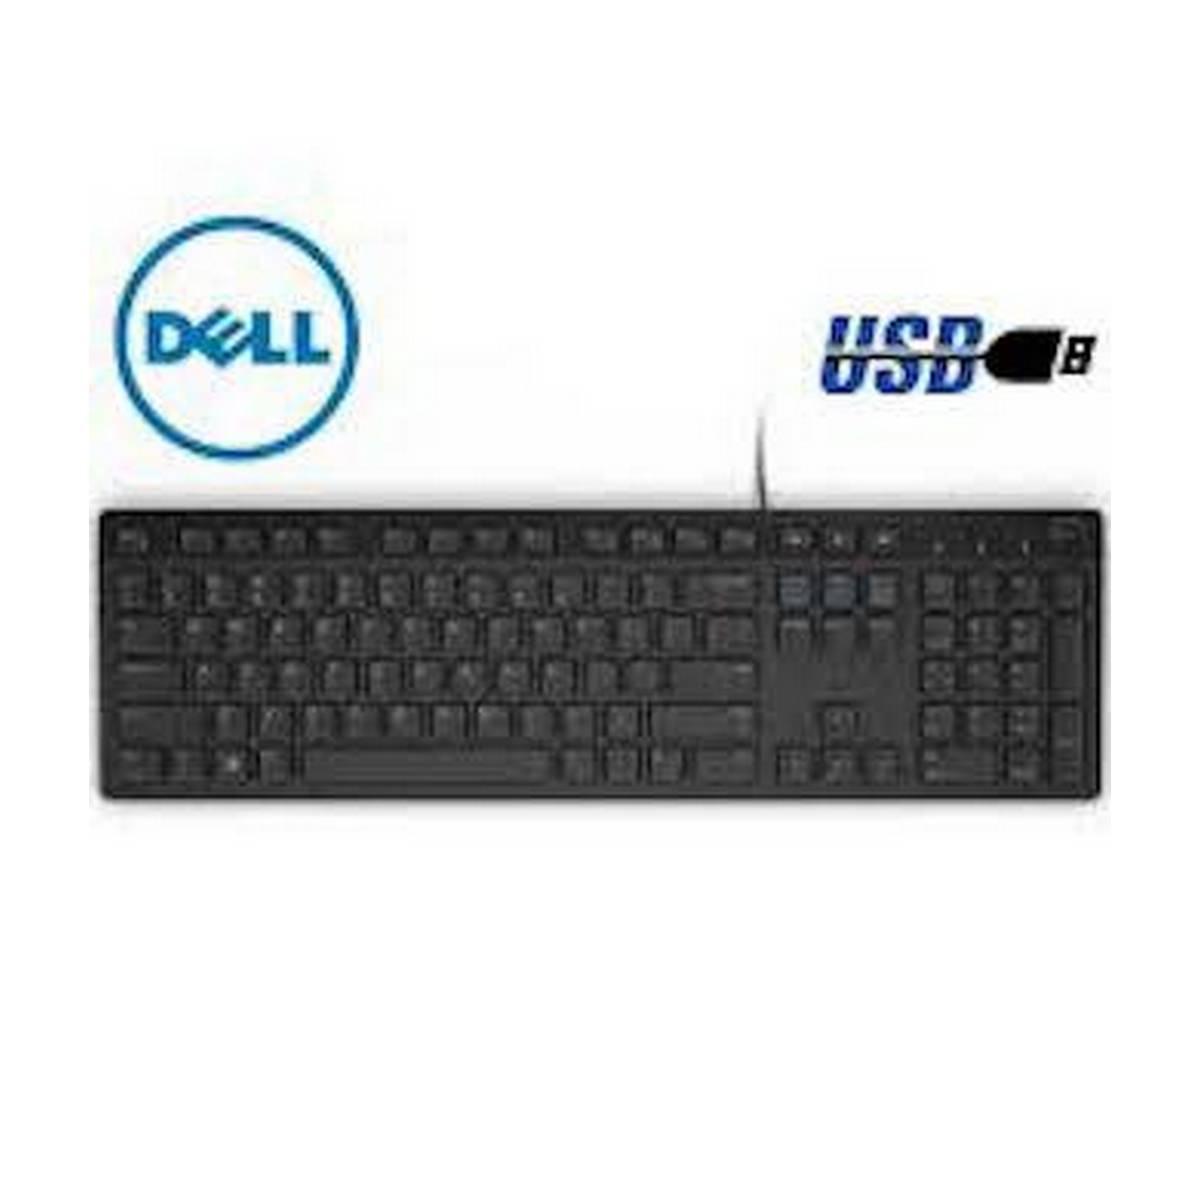 Kb216 Wired Usb - Multimedia Keyboard (Black) [used]